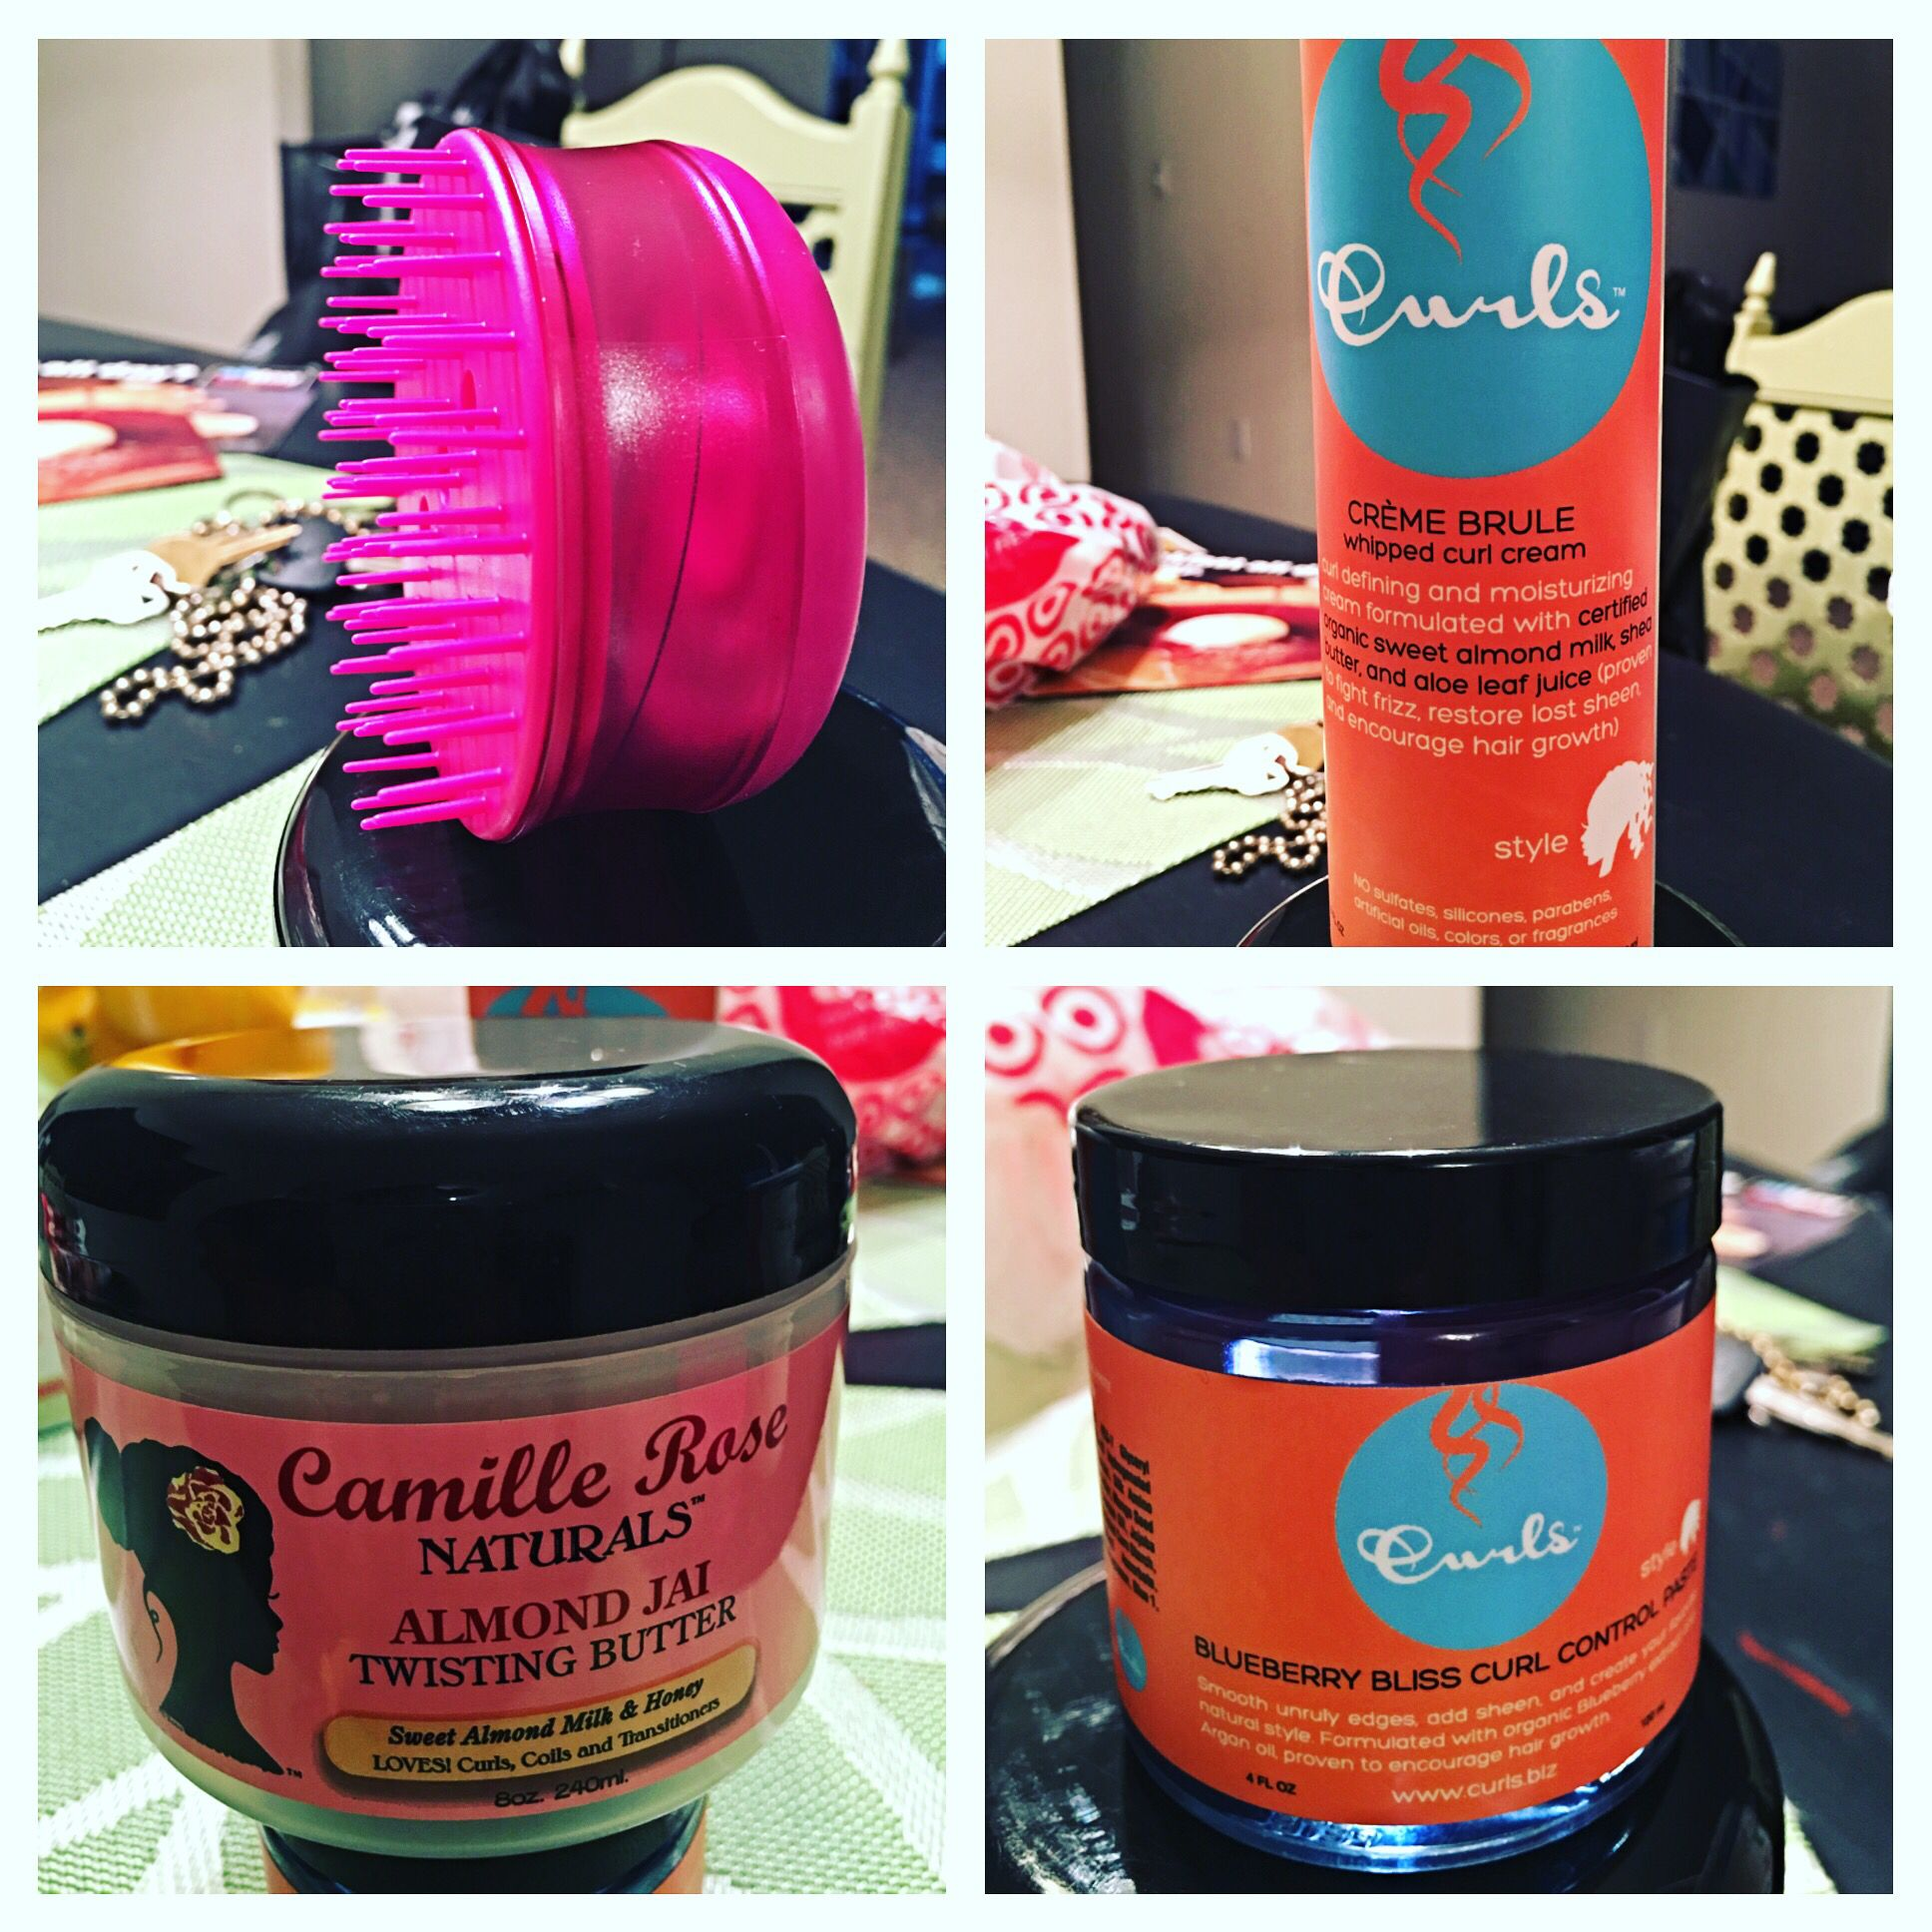 Hello, my name is Brenda and I am a Product Junky! #naturalhair #naturalista #teamnatural #blackhair #naturalhairdaily #berrycurly #curlyhair #afro #curls #4a #twistout #naturalhaircommunity #naturalhairdoescare #naturalhairjunkies #curlyfro #transitioning #healthyhair #bigchop #blackgirlsrock #washandgo #bighair #curlygirls #hairtutorial #kinkycurly #coils #textureshot  #haircrush #healthy_hair_journey #braidout #kinkyhair